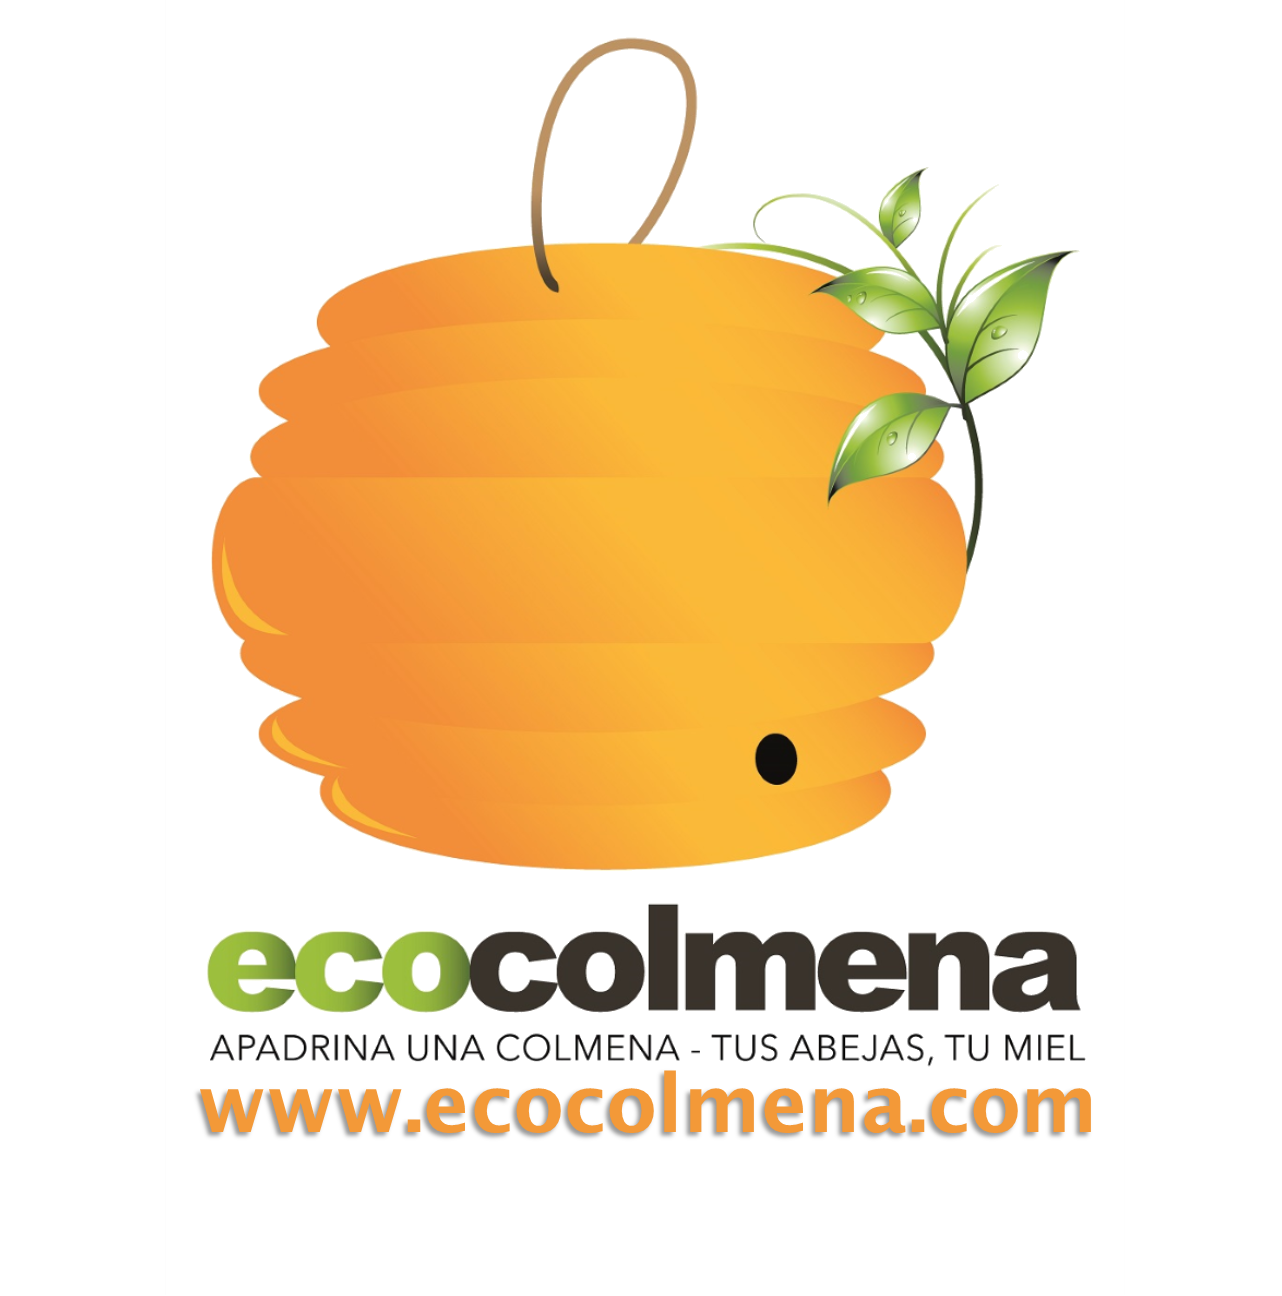 ecocolmena-Logo-transparente-Watermark